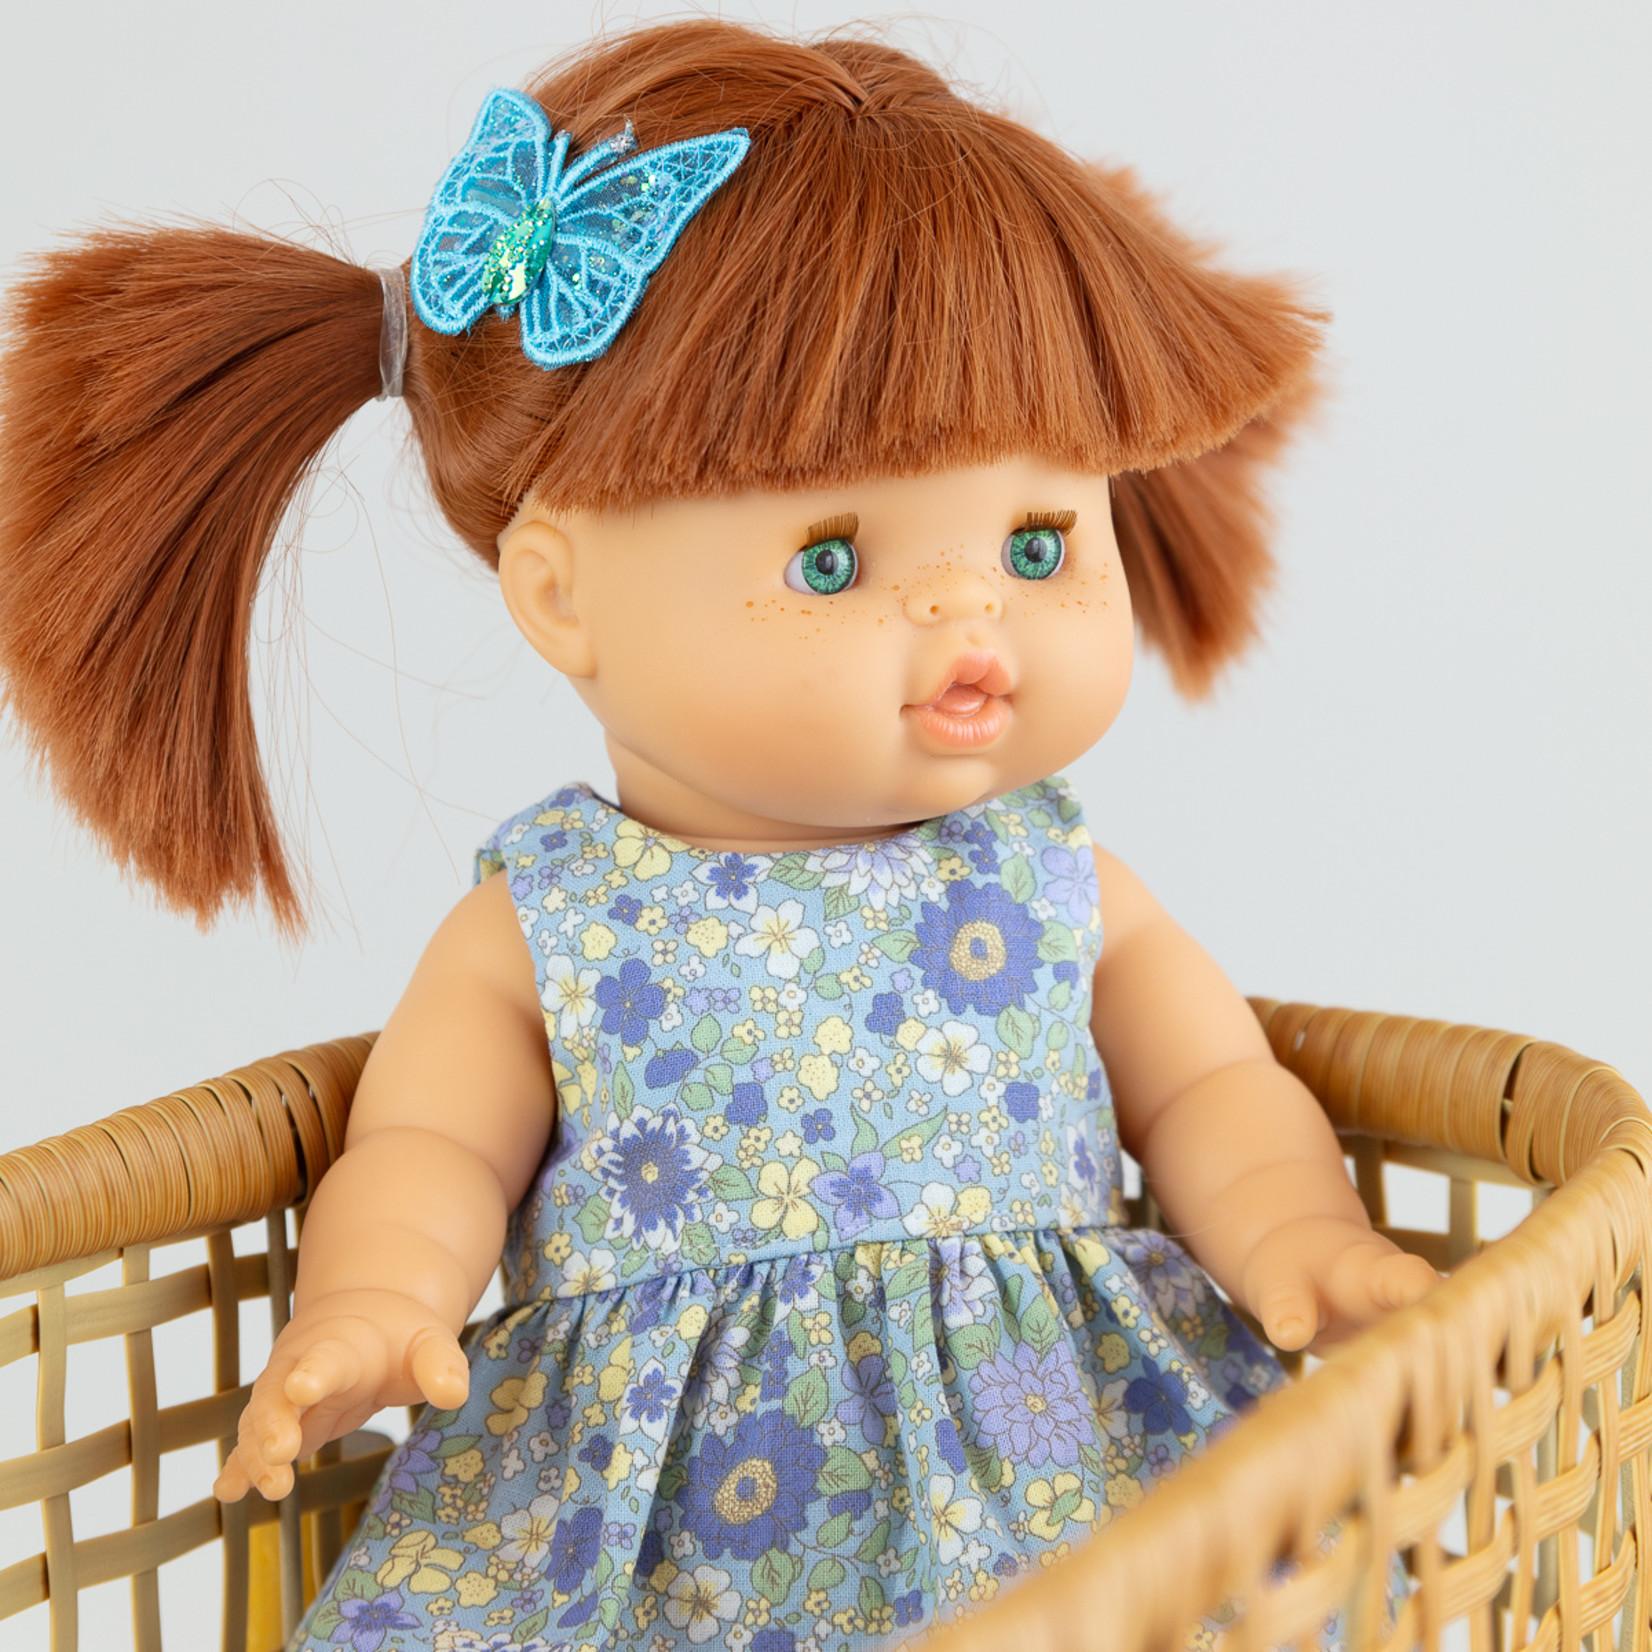 Wacky Wardrobe Wacky Wardrobe 32cm Doll Dress